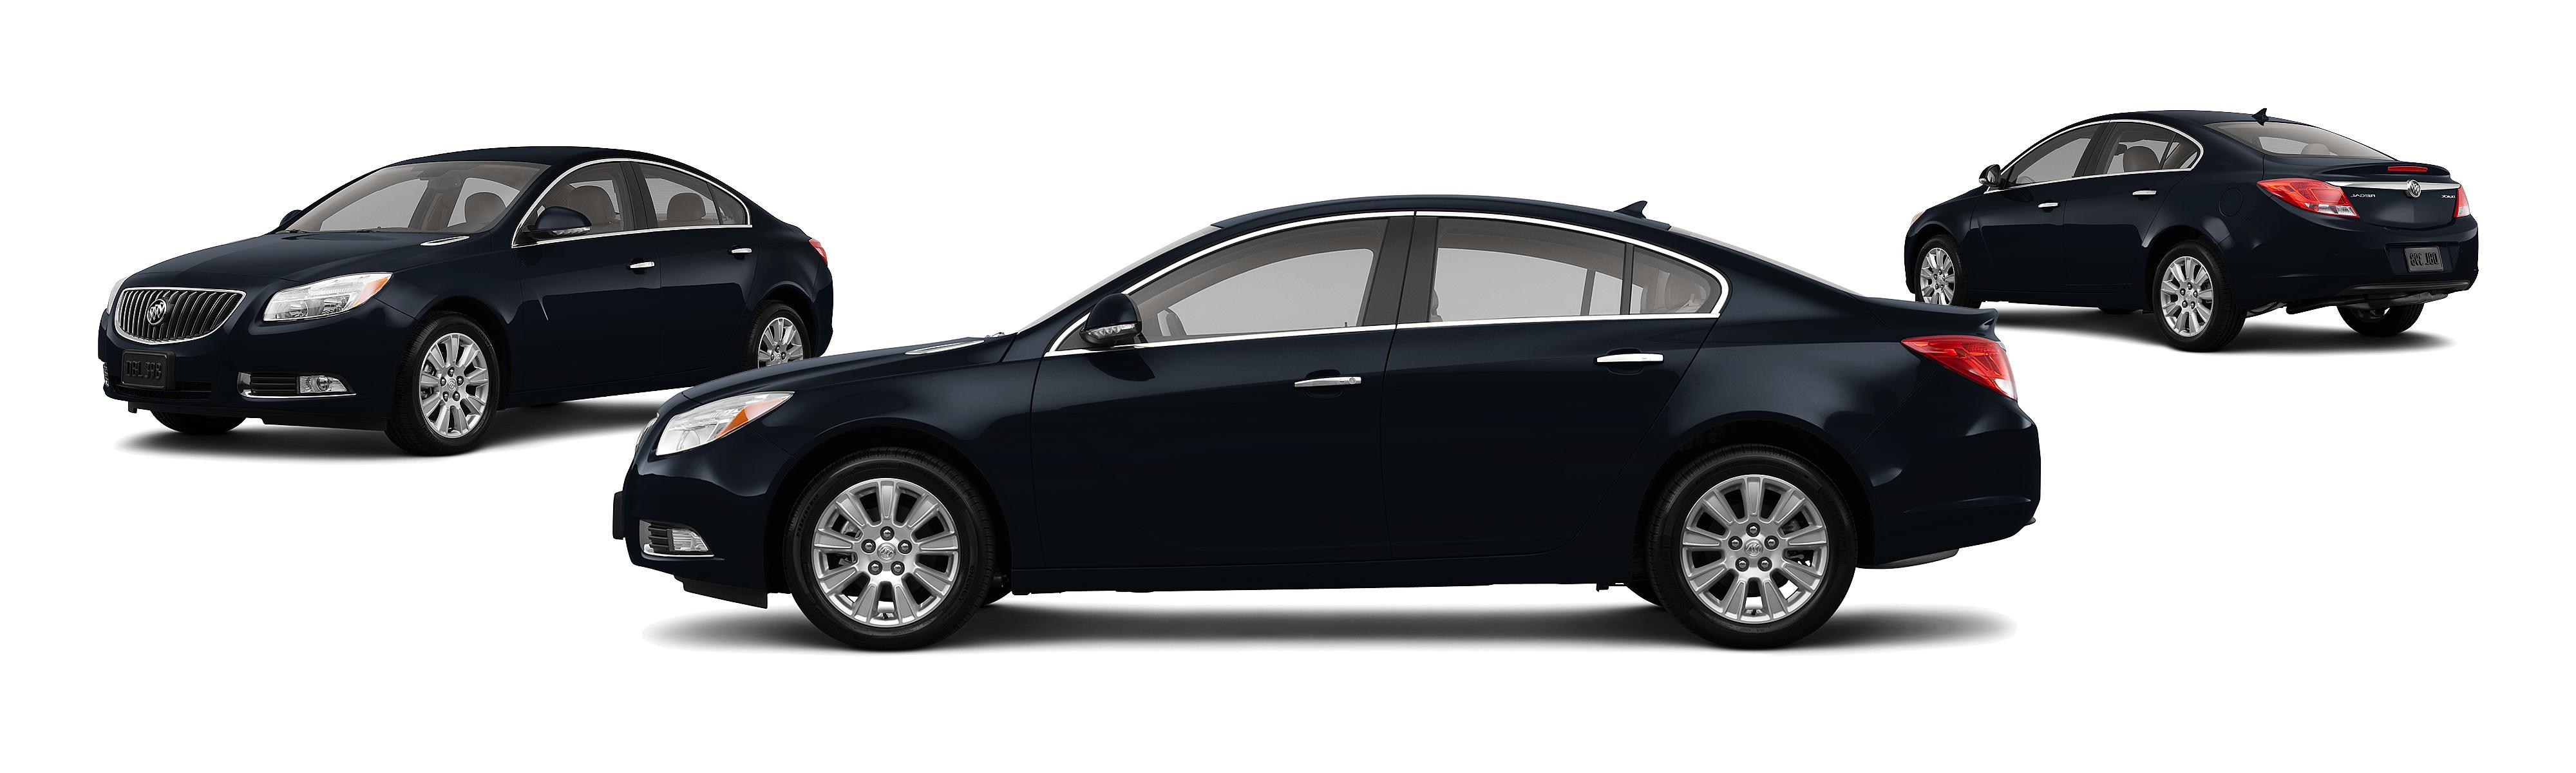 regal date gt buick best price upgrade release future cars img subaru gs turbo sport of legacy